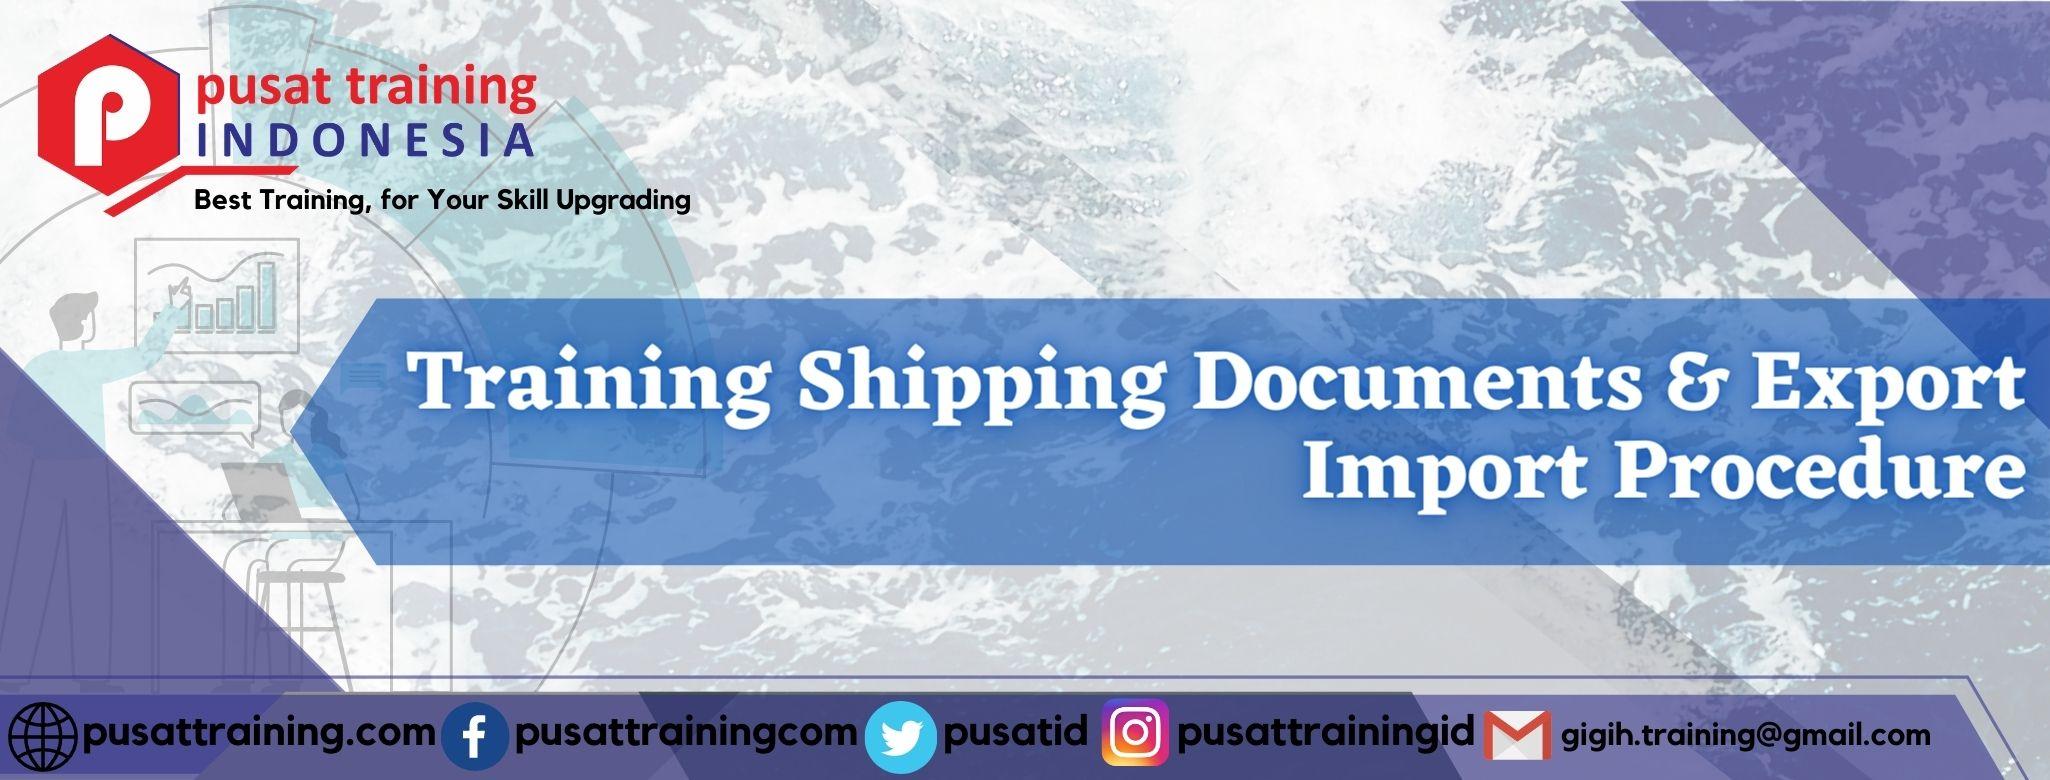 Training Shipping Documents & Export Import Procedure